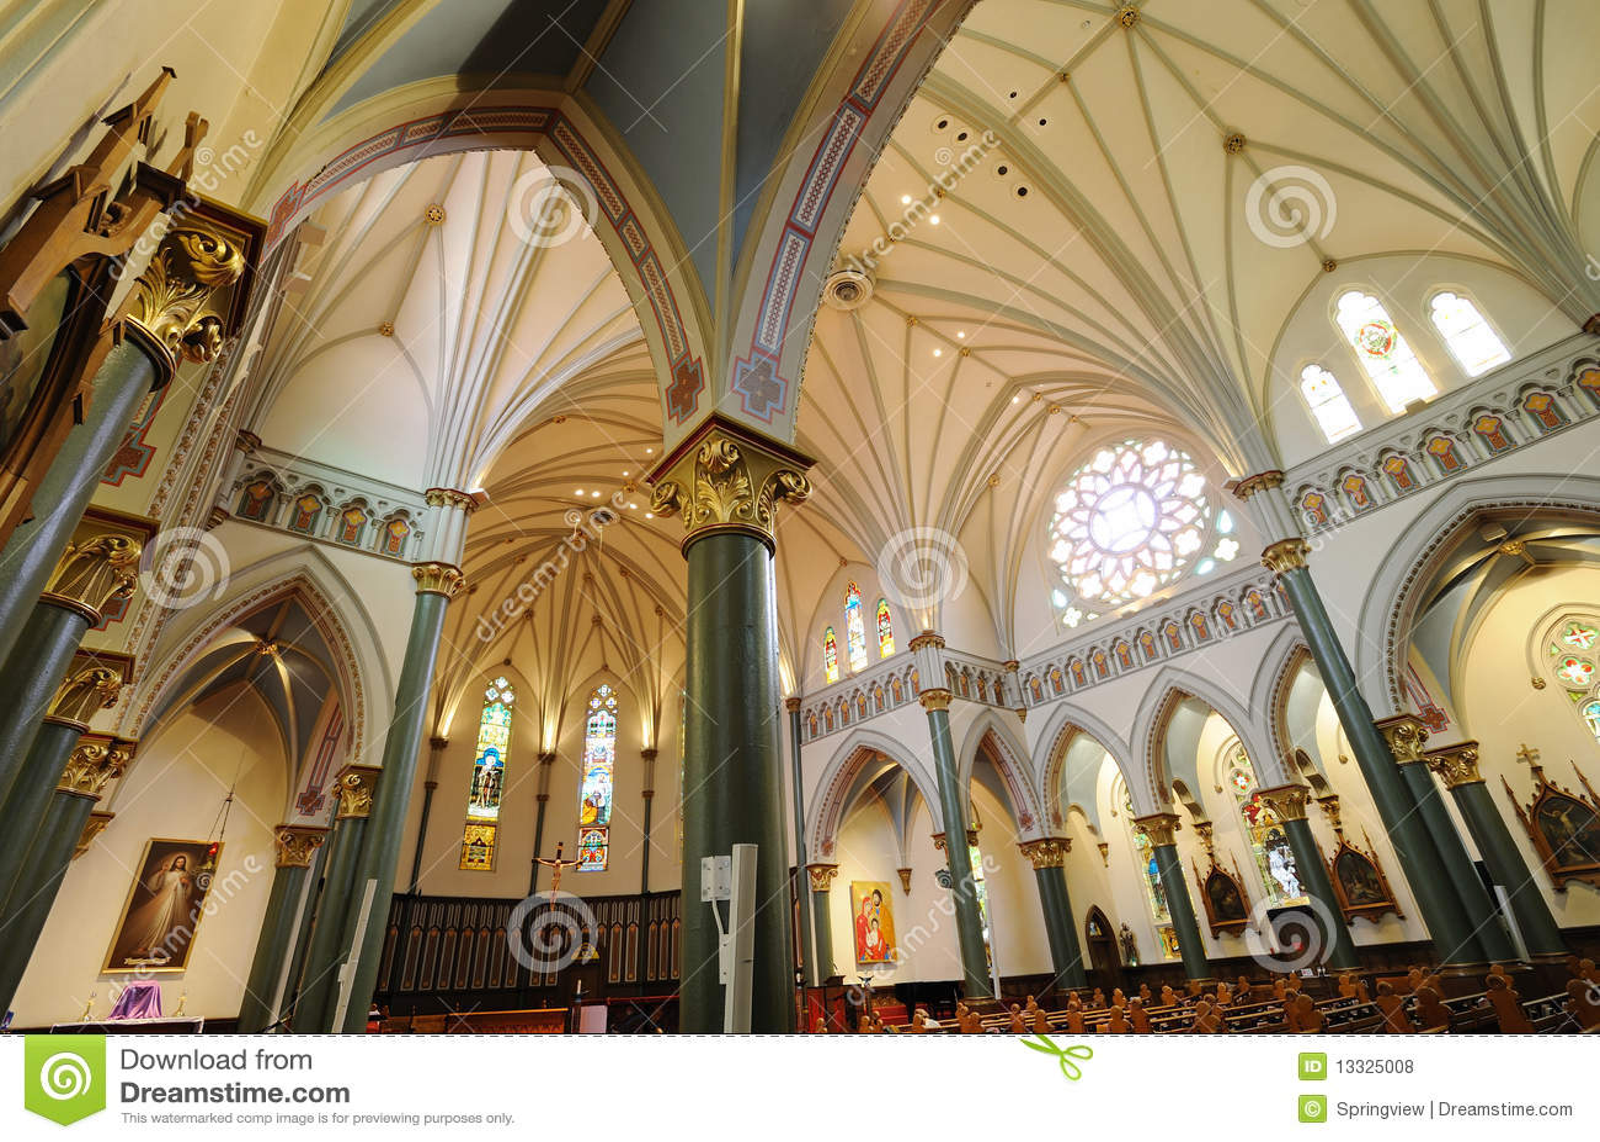 Church Interiors Royalty Free Stock Photos Image